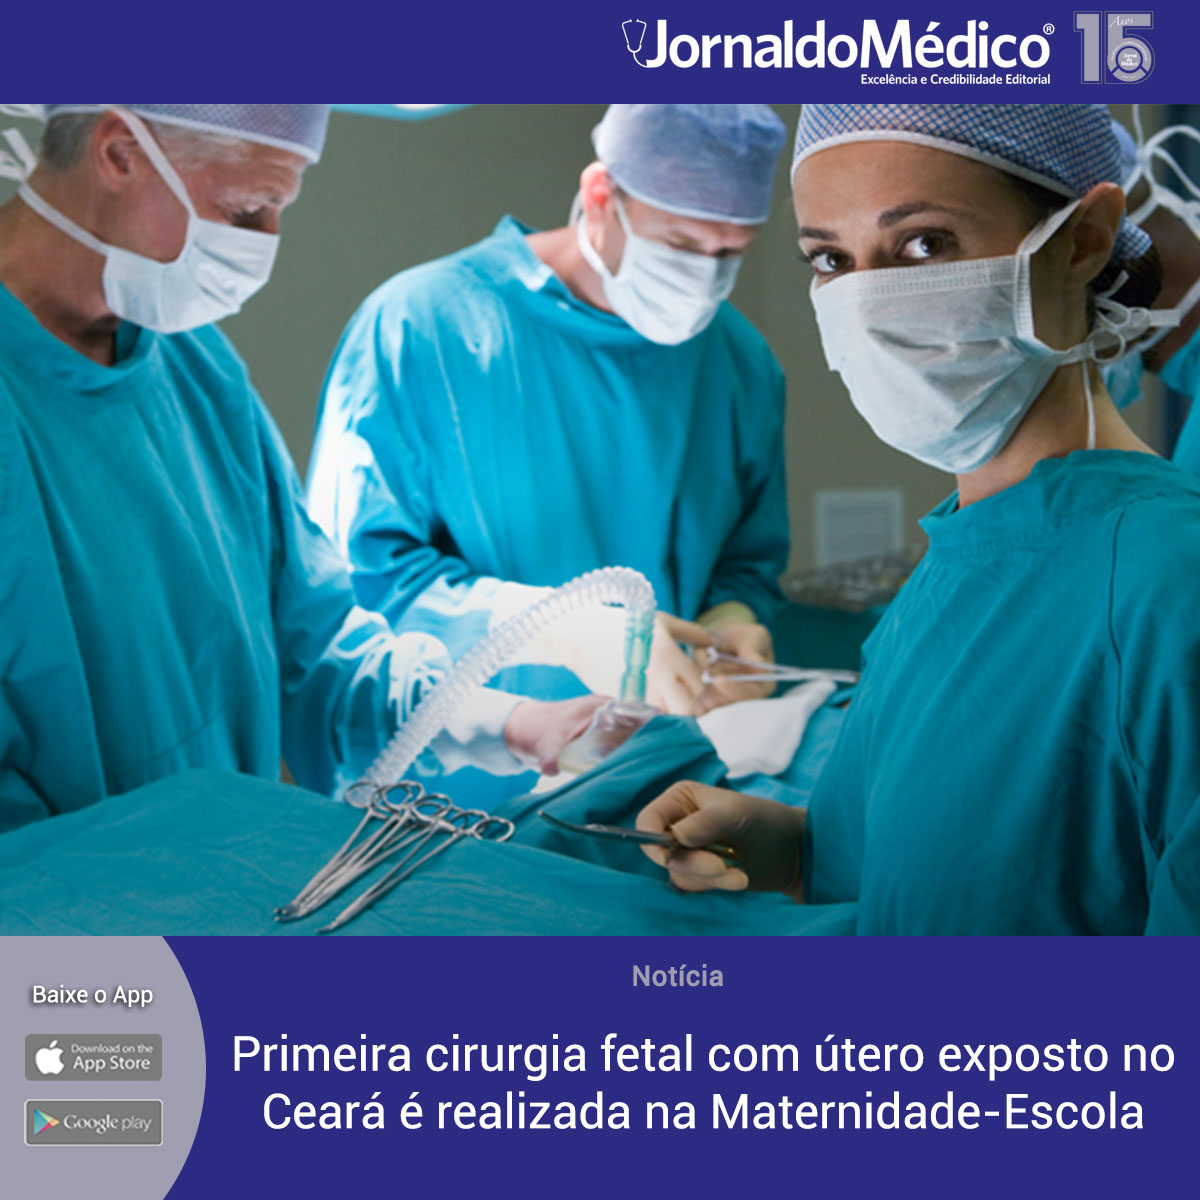 Primeira cirurgia fetal com útero exposto no Ceará é